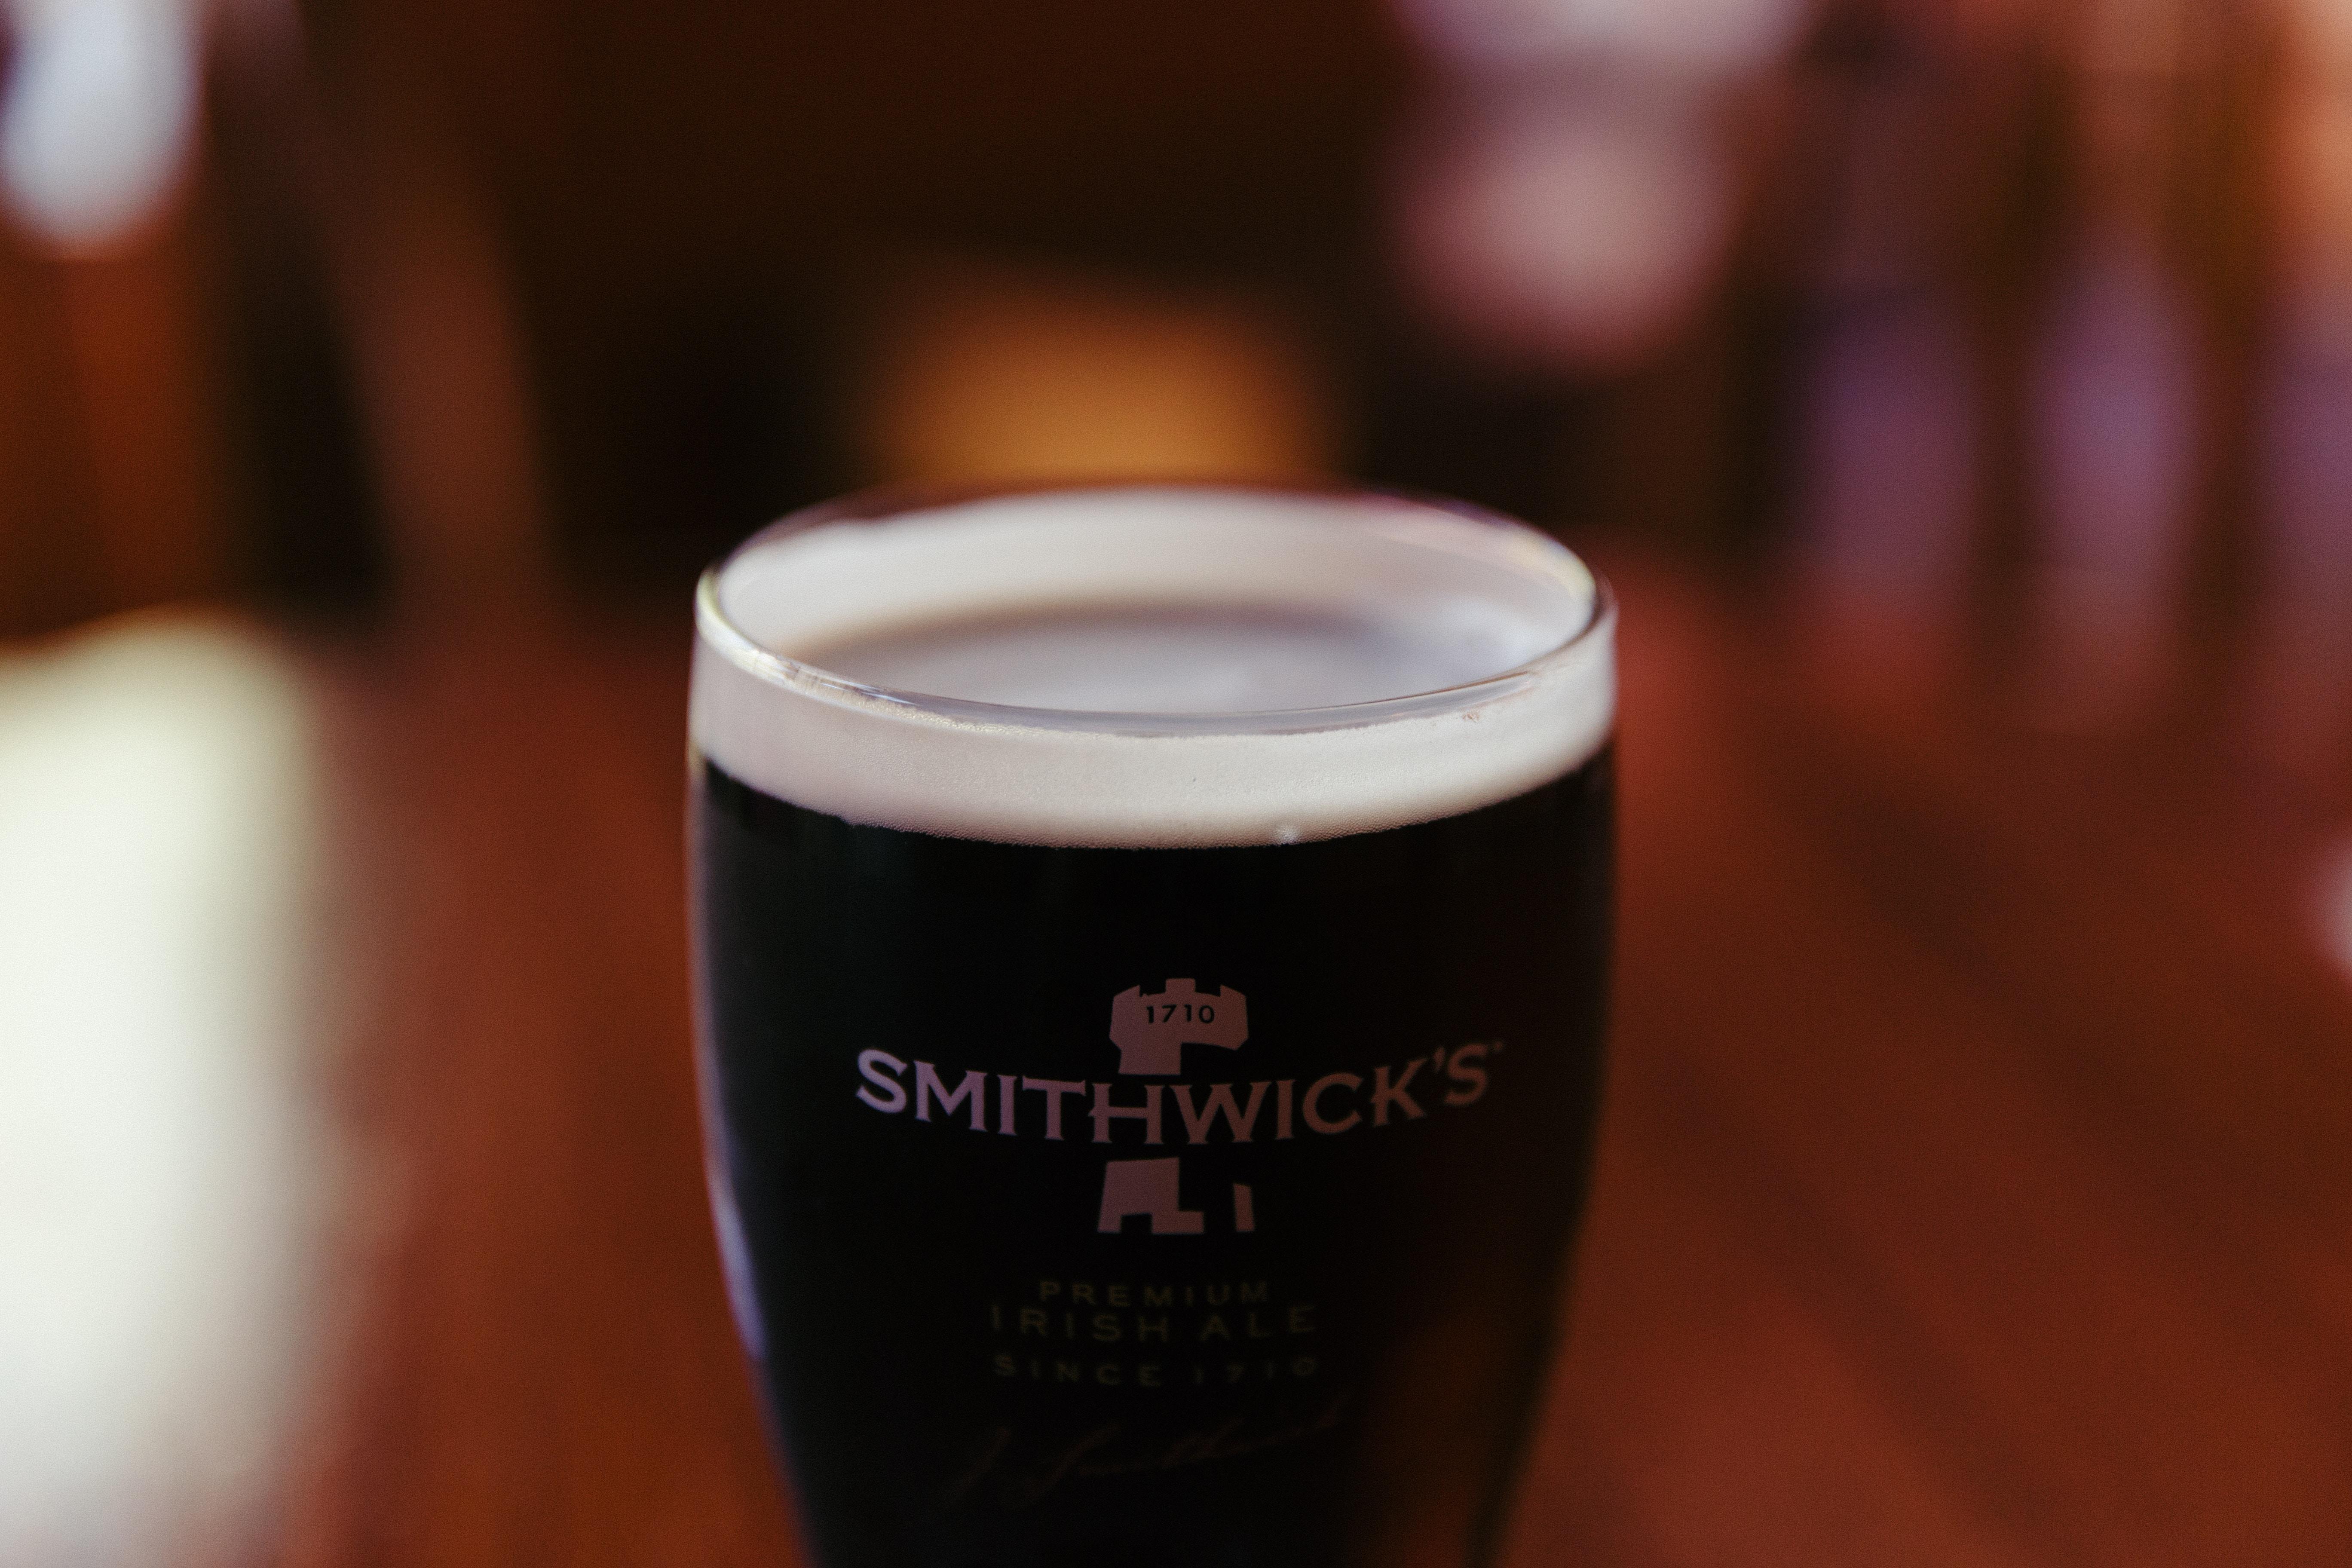 clear Smithwick's glass with coffee